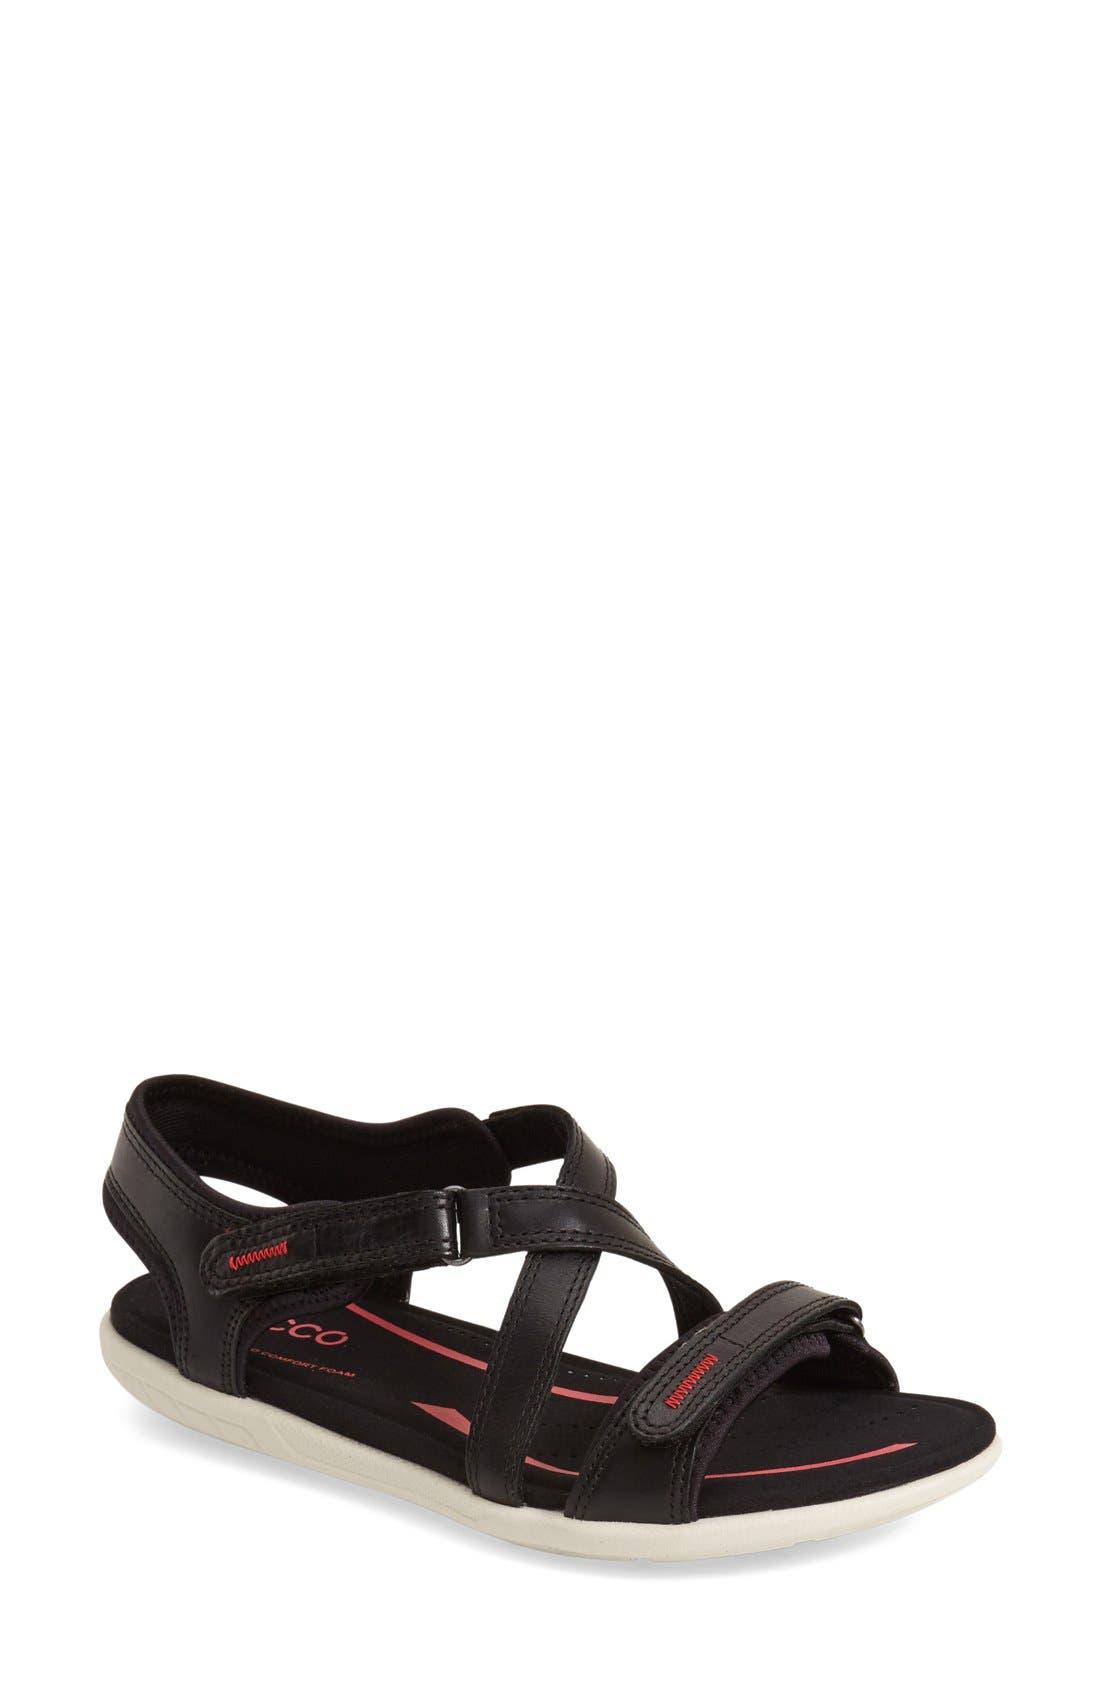 'Bluma' Sport Sandal,                         Main,                         color, Black Leather